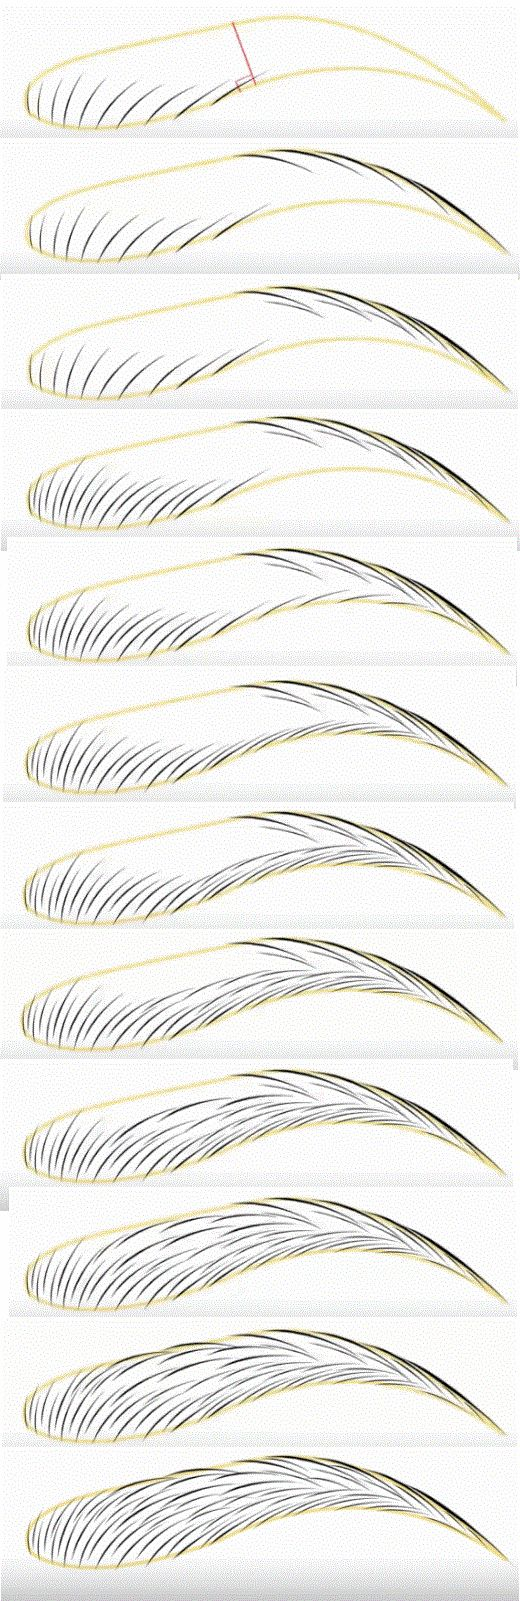 Eyebrow Threading Machine | Makeup Eyebrow Pencil | Best ...